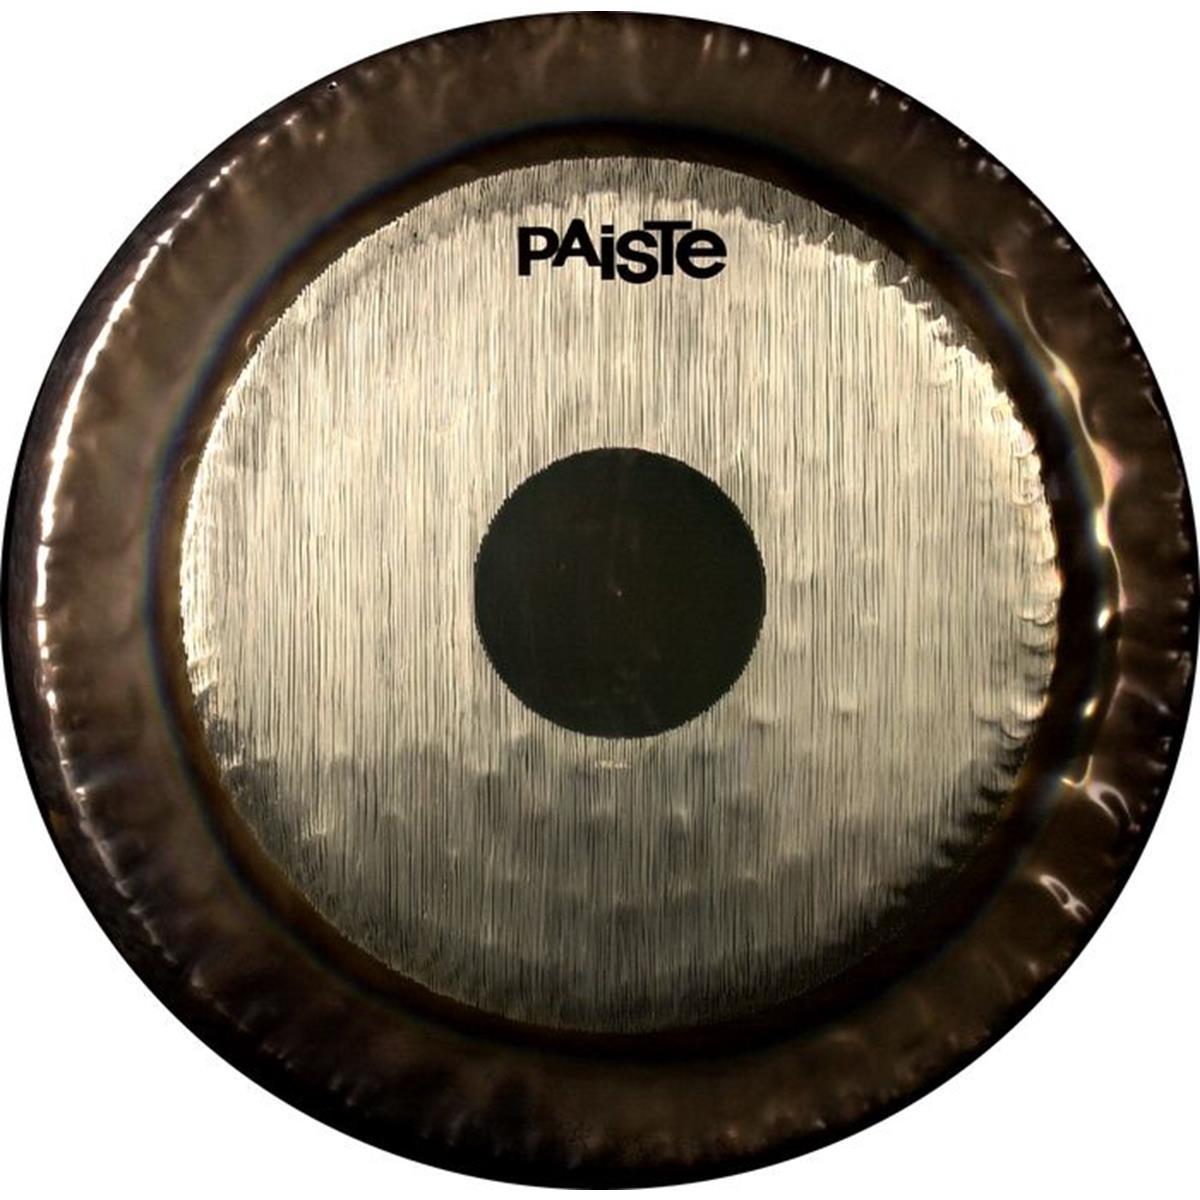 PAISTE GONG26 - Paiste Symphonic Gong 26 - Batterie / Percussioni Piatti - China e Altri